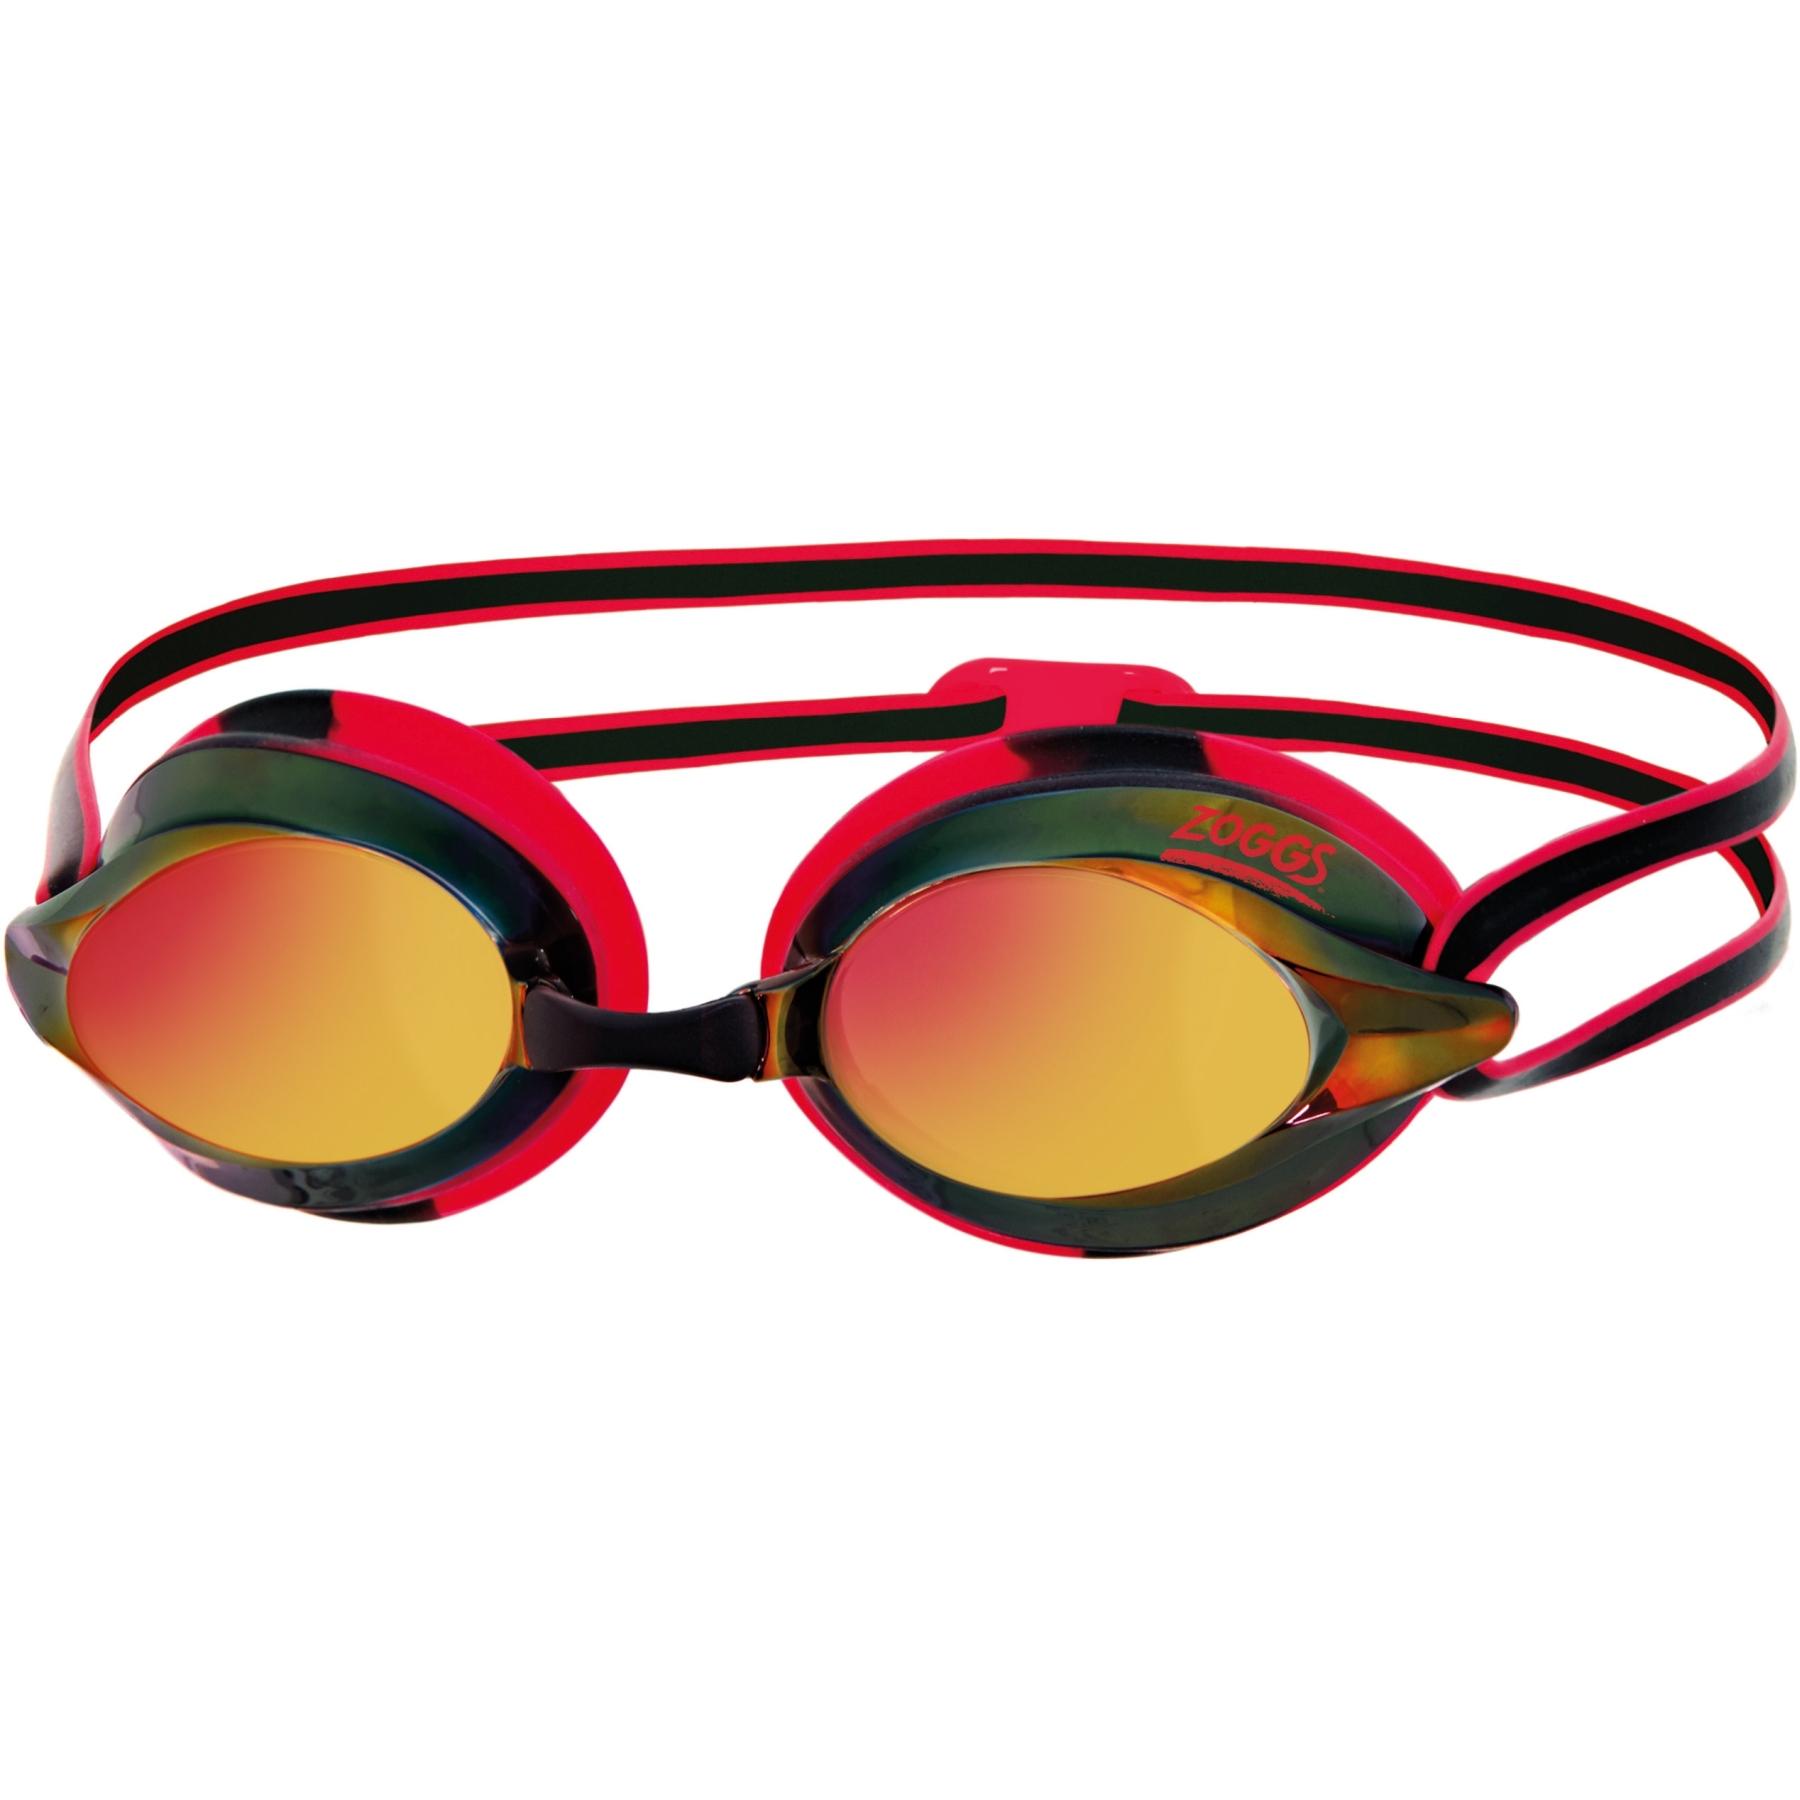 Zoggs Racespex Mirror Schwimmbrille - black/red/mirrored